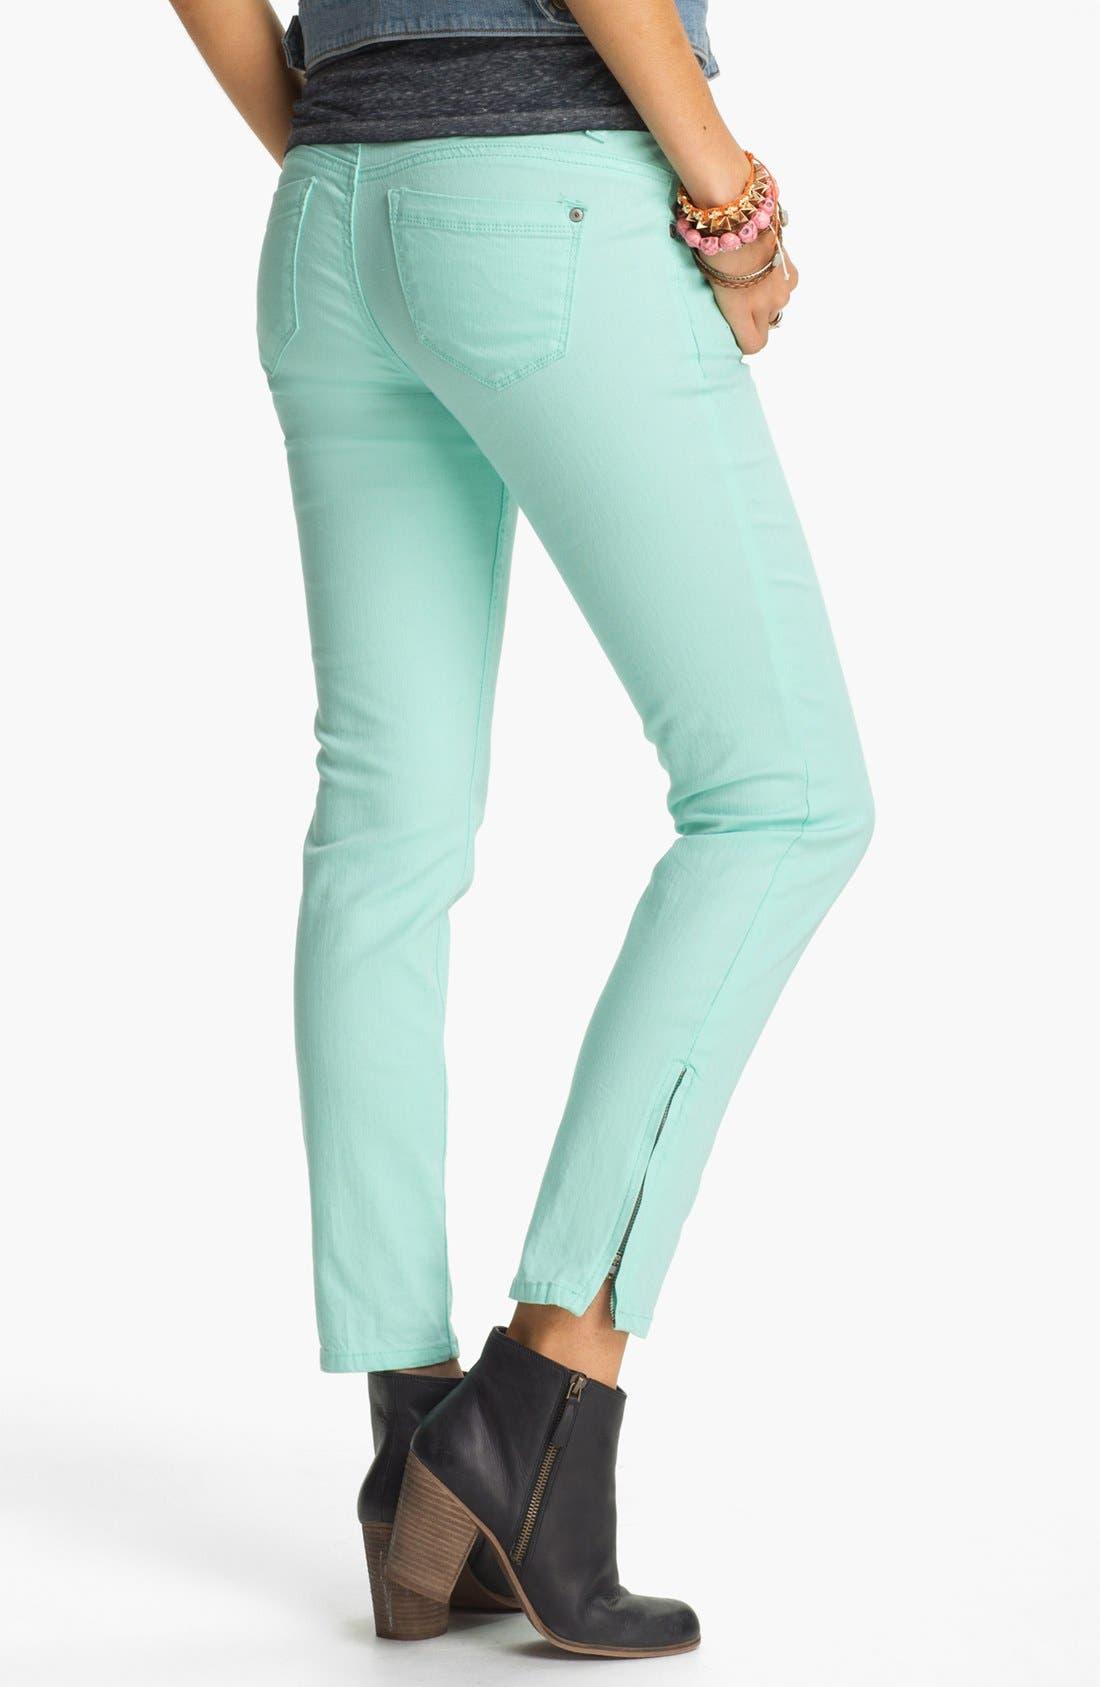 Alternate Image 1 Selected - Jolt Ankle Zip Skinny Jeans (Juniors)